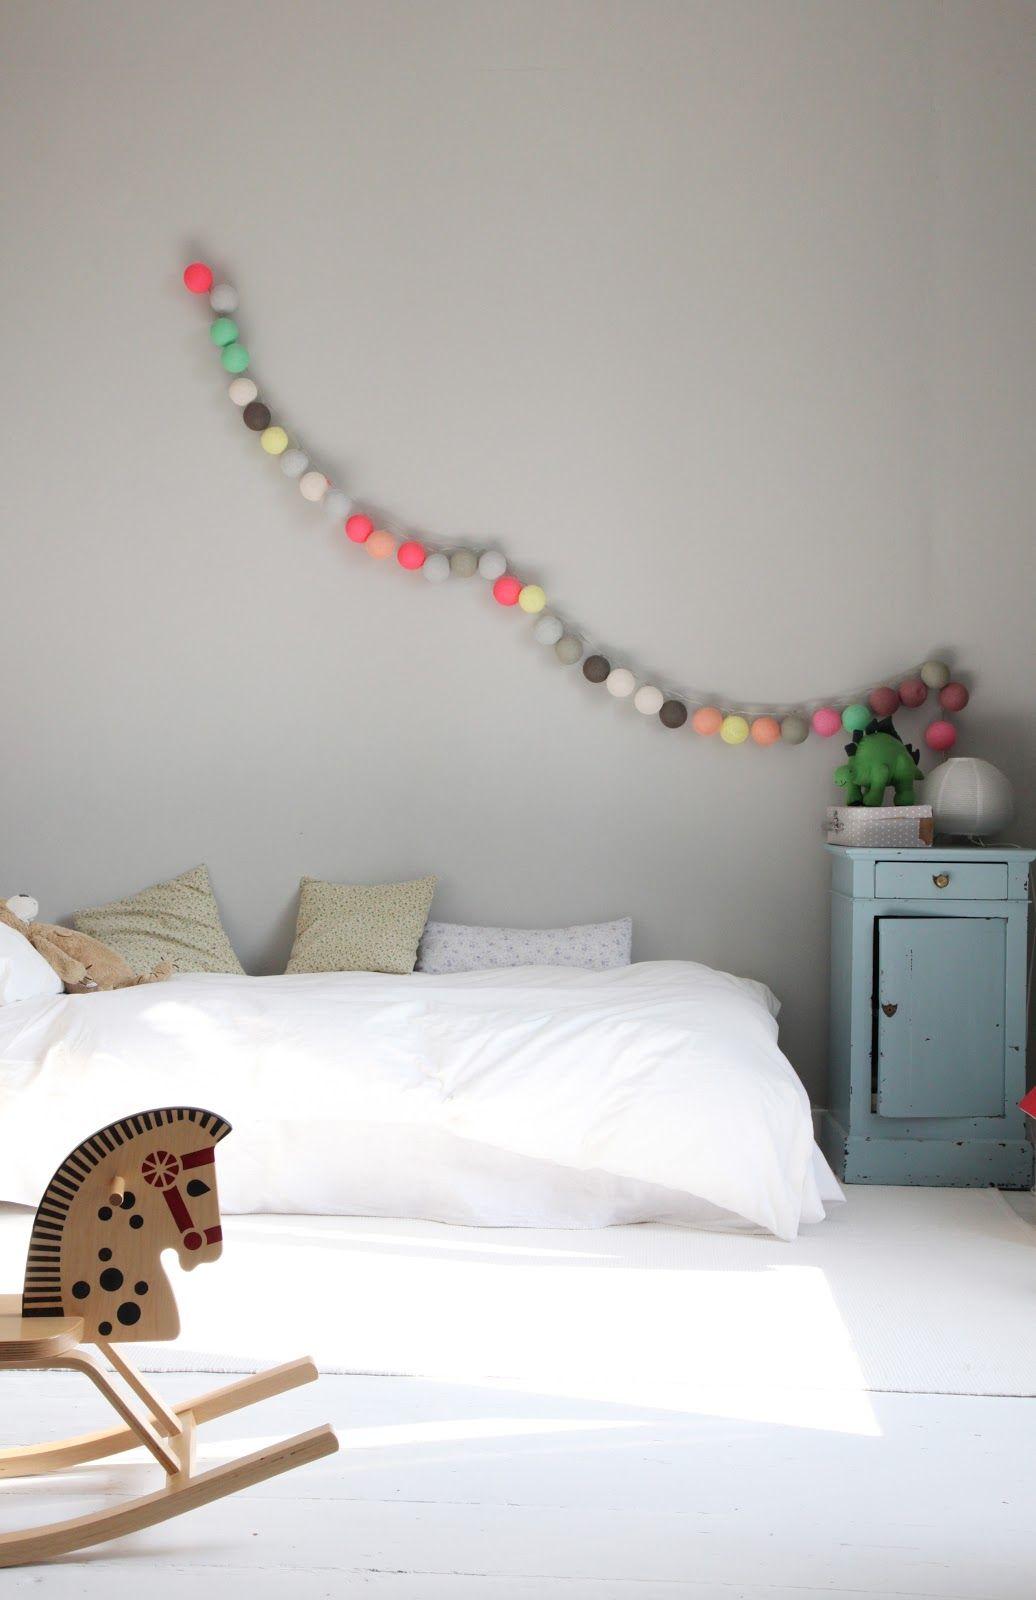 Ledansla meubles repeints pinterest kids rooms room